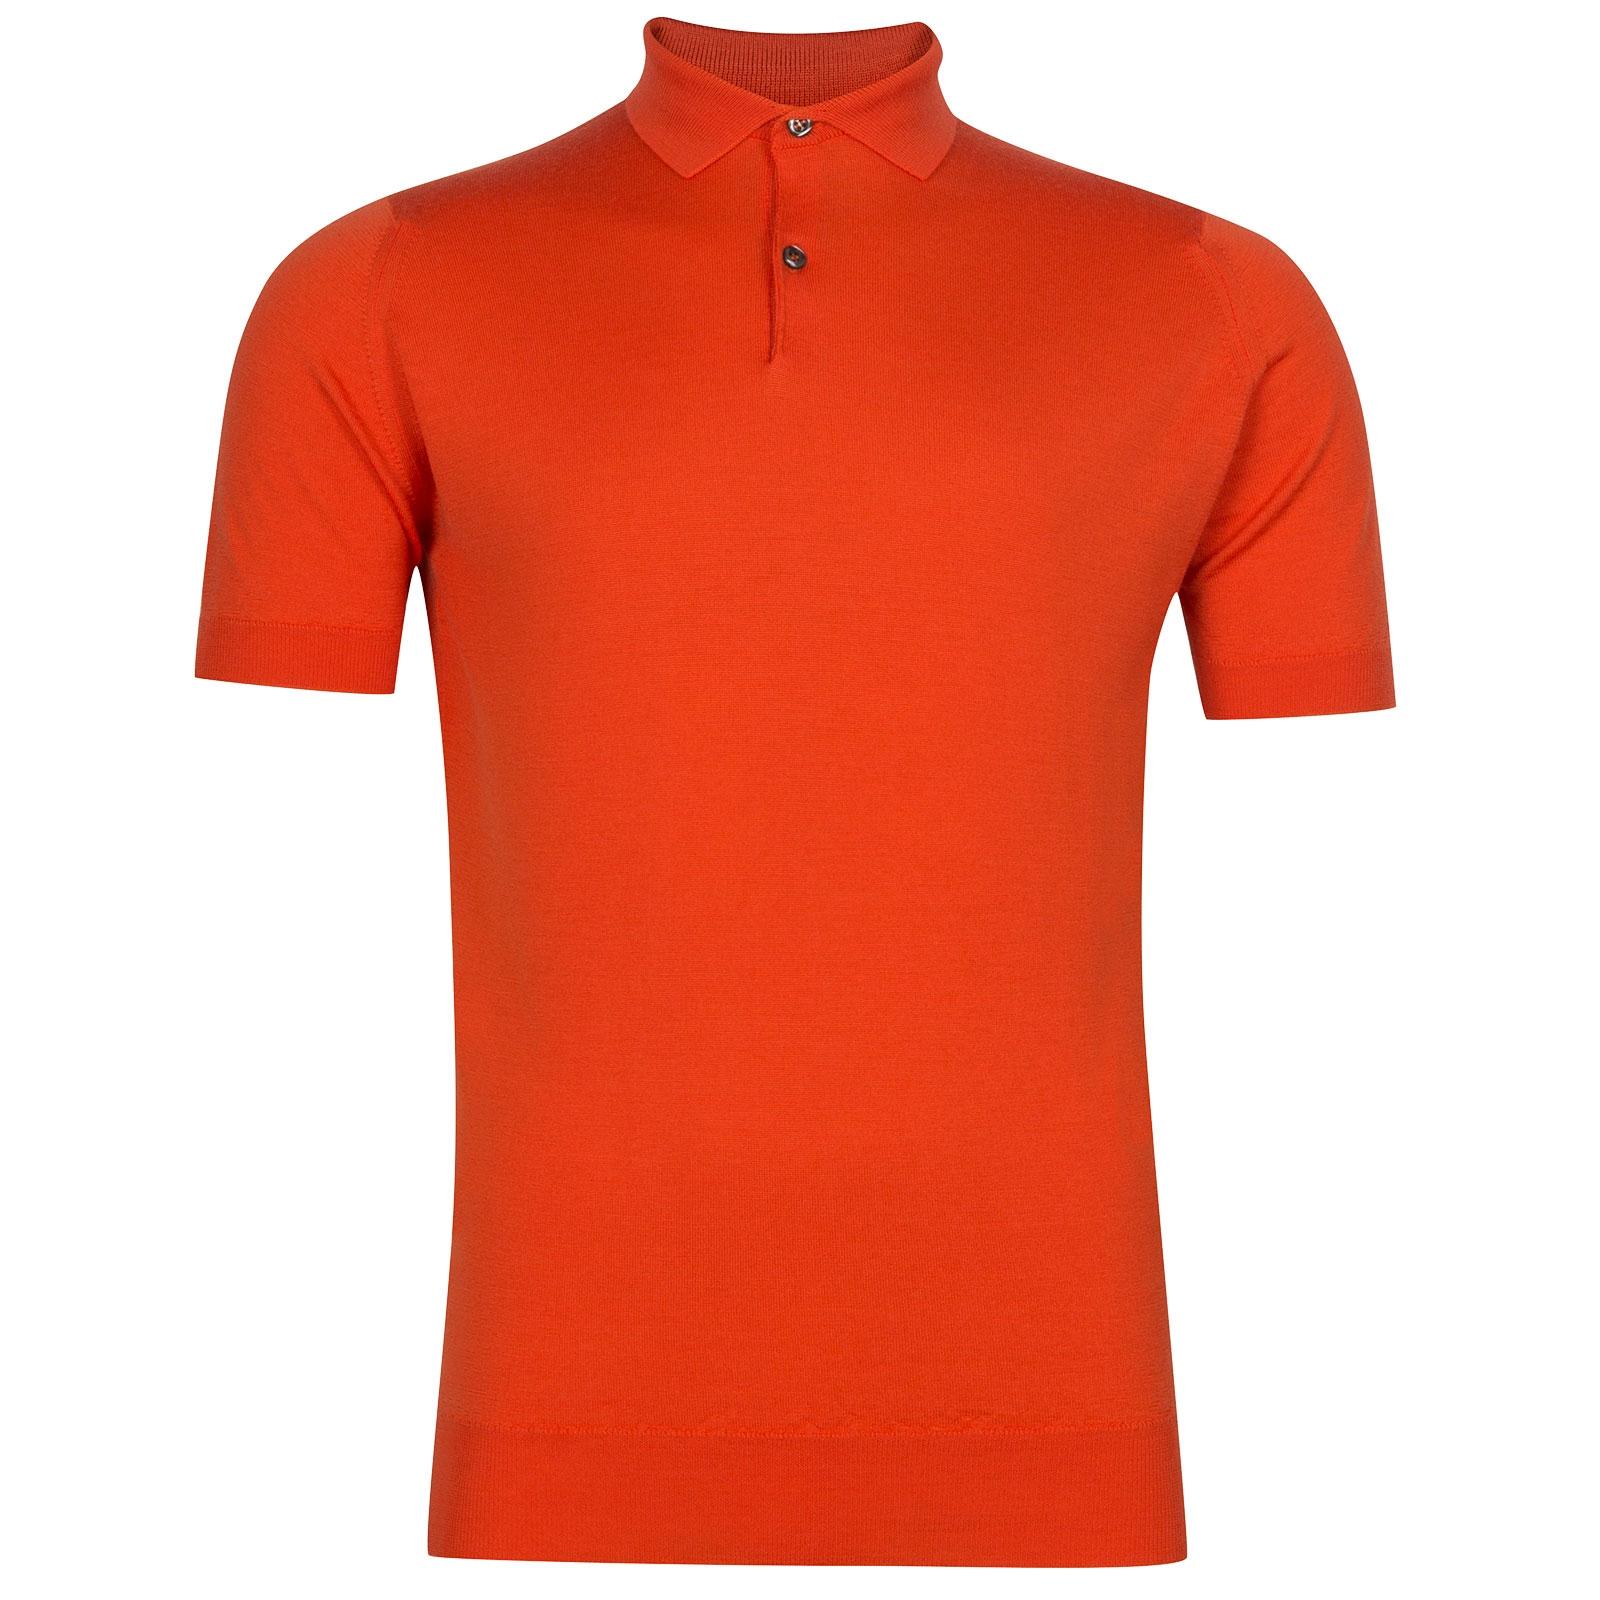 John Smedley Payton Merino Wool Shirt in Blaze Orange-XL